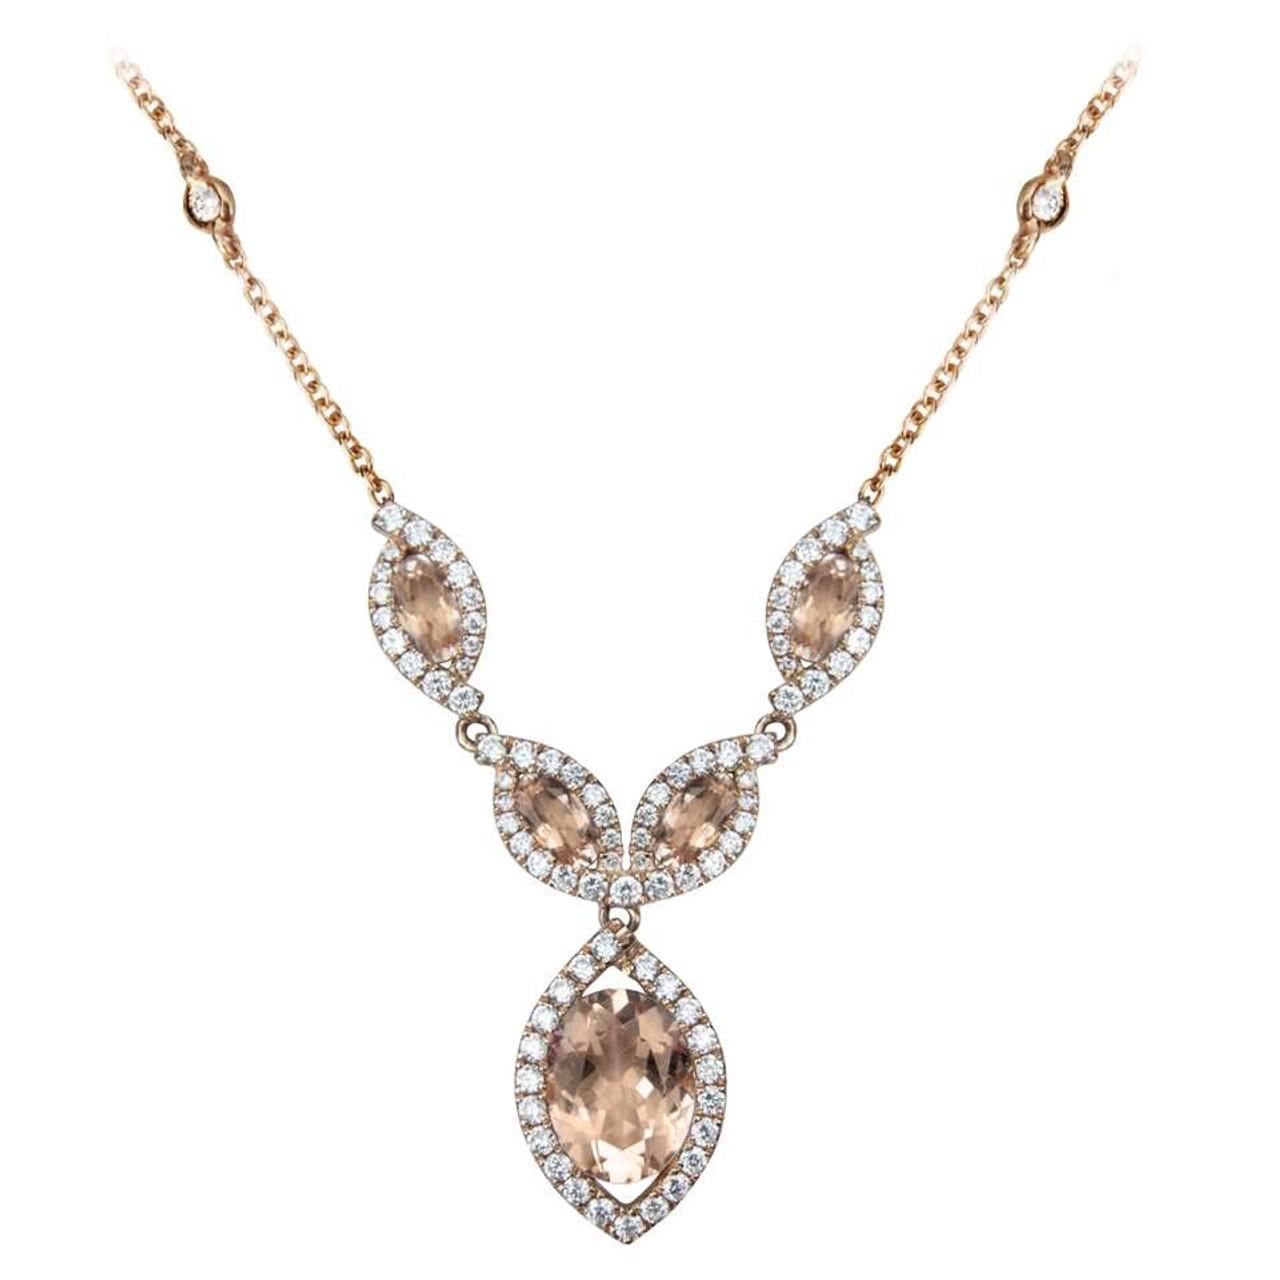 18ct Rose Gold Morganite & Diamond Necklace